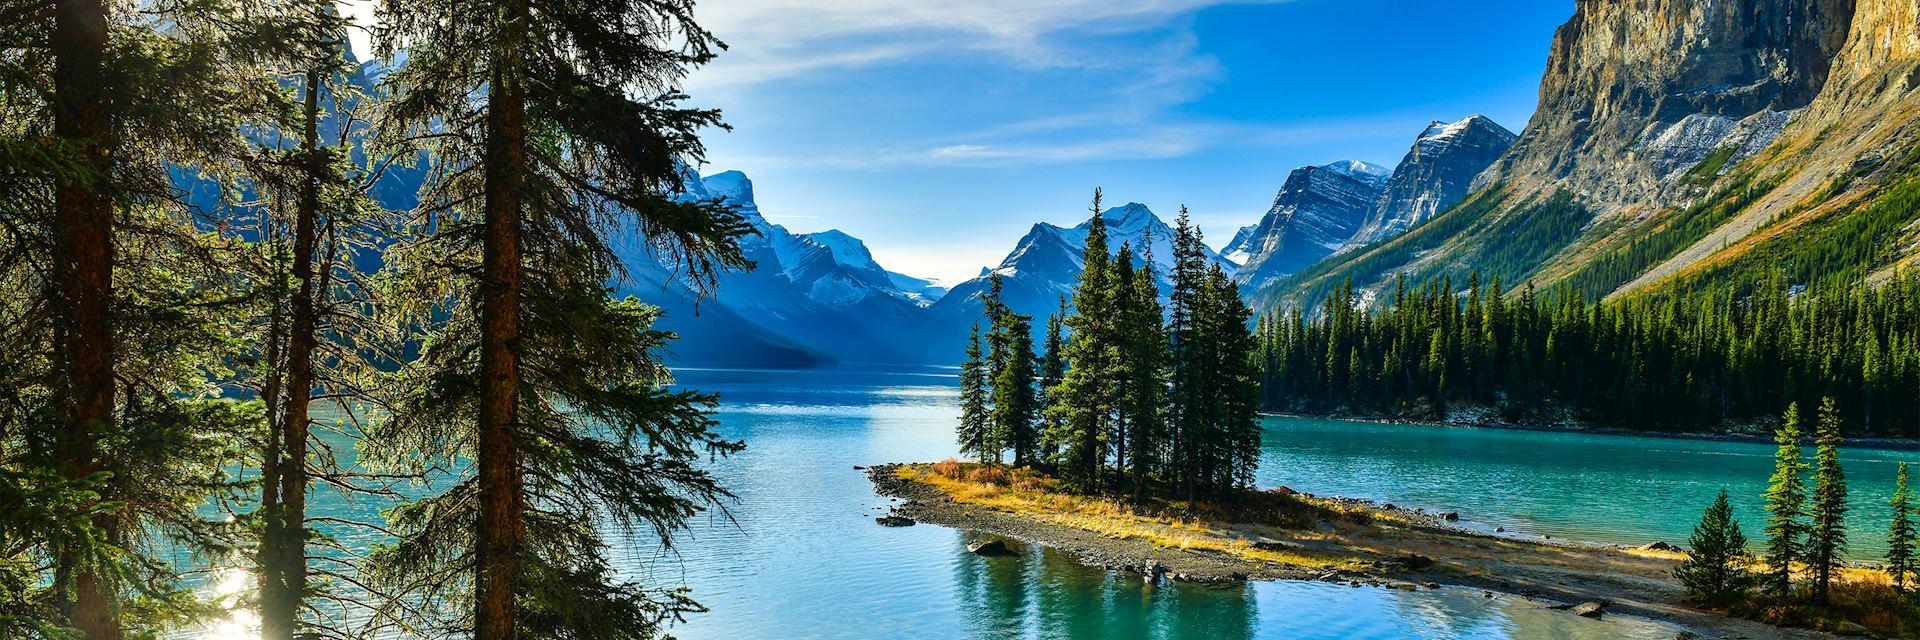 Spirit Island in Maligne Lake, Jasper National Park